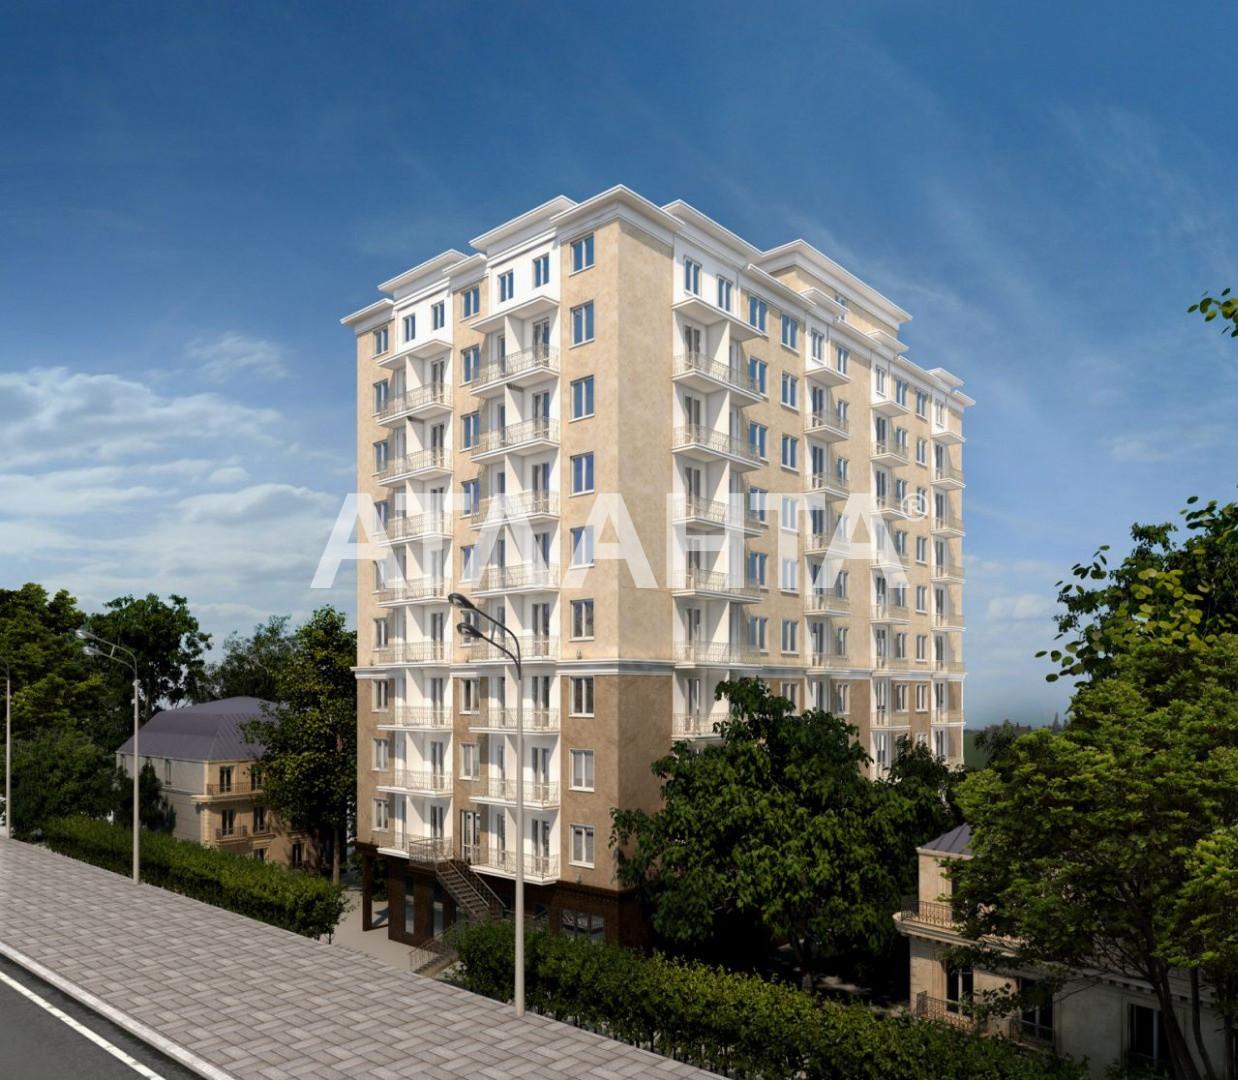 Продается 2-комнатная Квартира на ул. Балковская (Фрунзе) — 39 900 у.е. (фото №2)